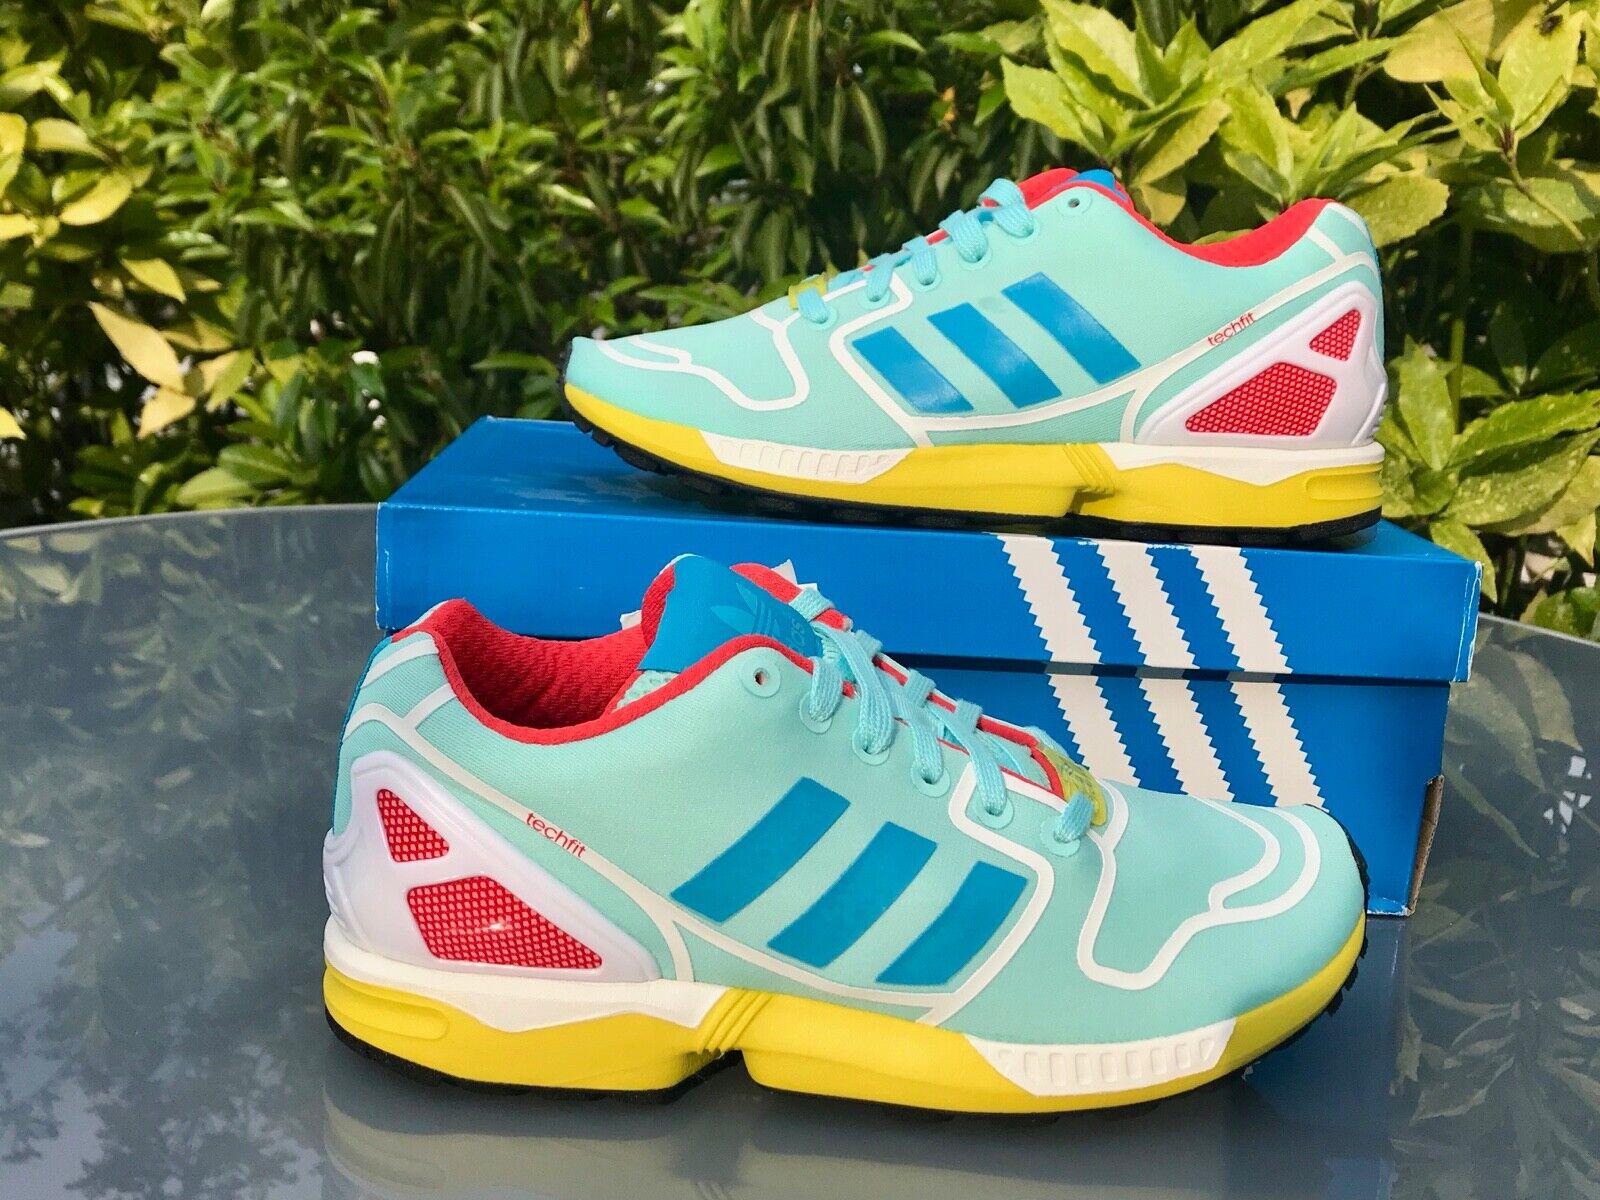 Adidas ZX Flux Techfit  HYDRA  (2015) EUR 38 2 3 US 6 UK 5,5 AF6304 Torsion 9000